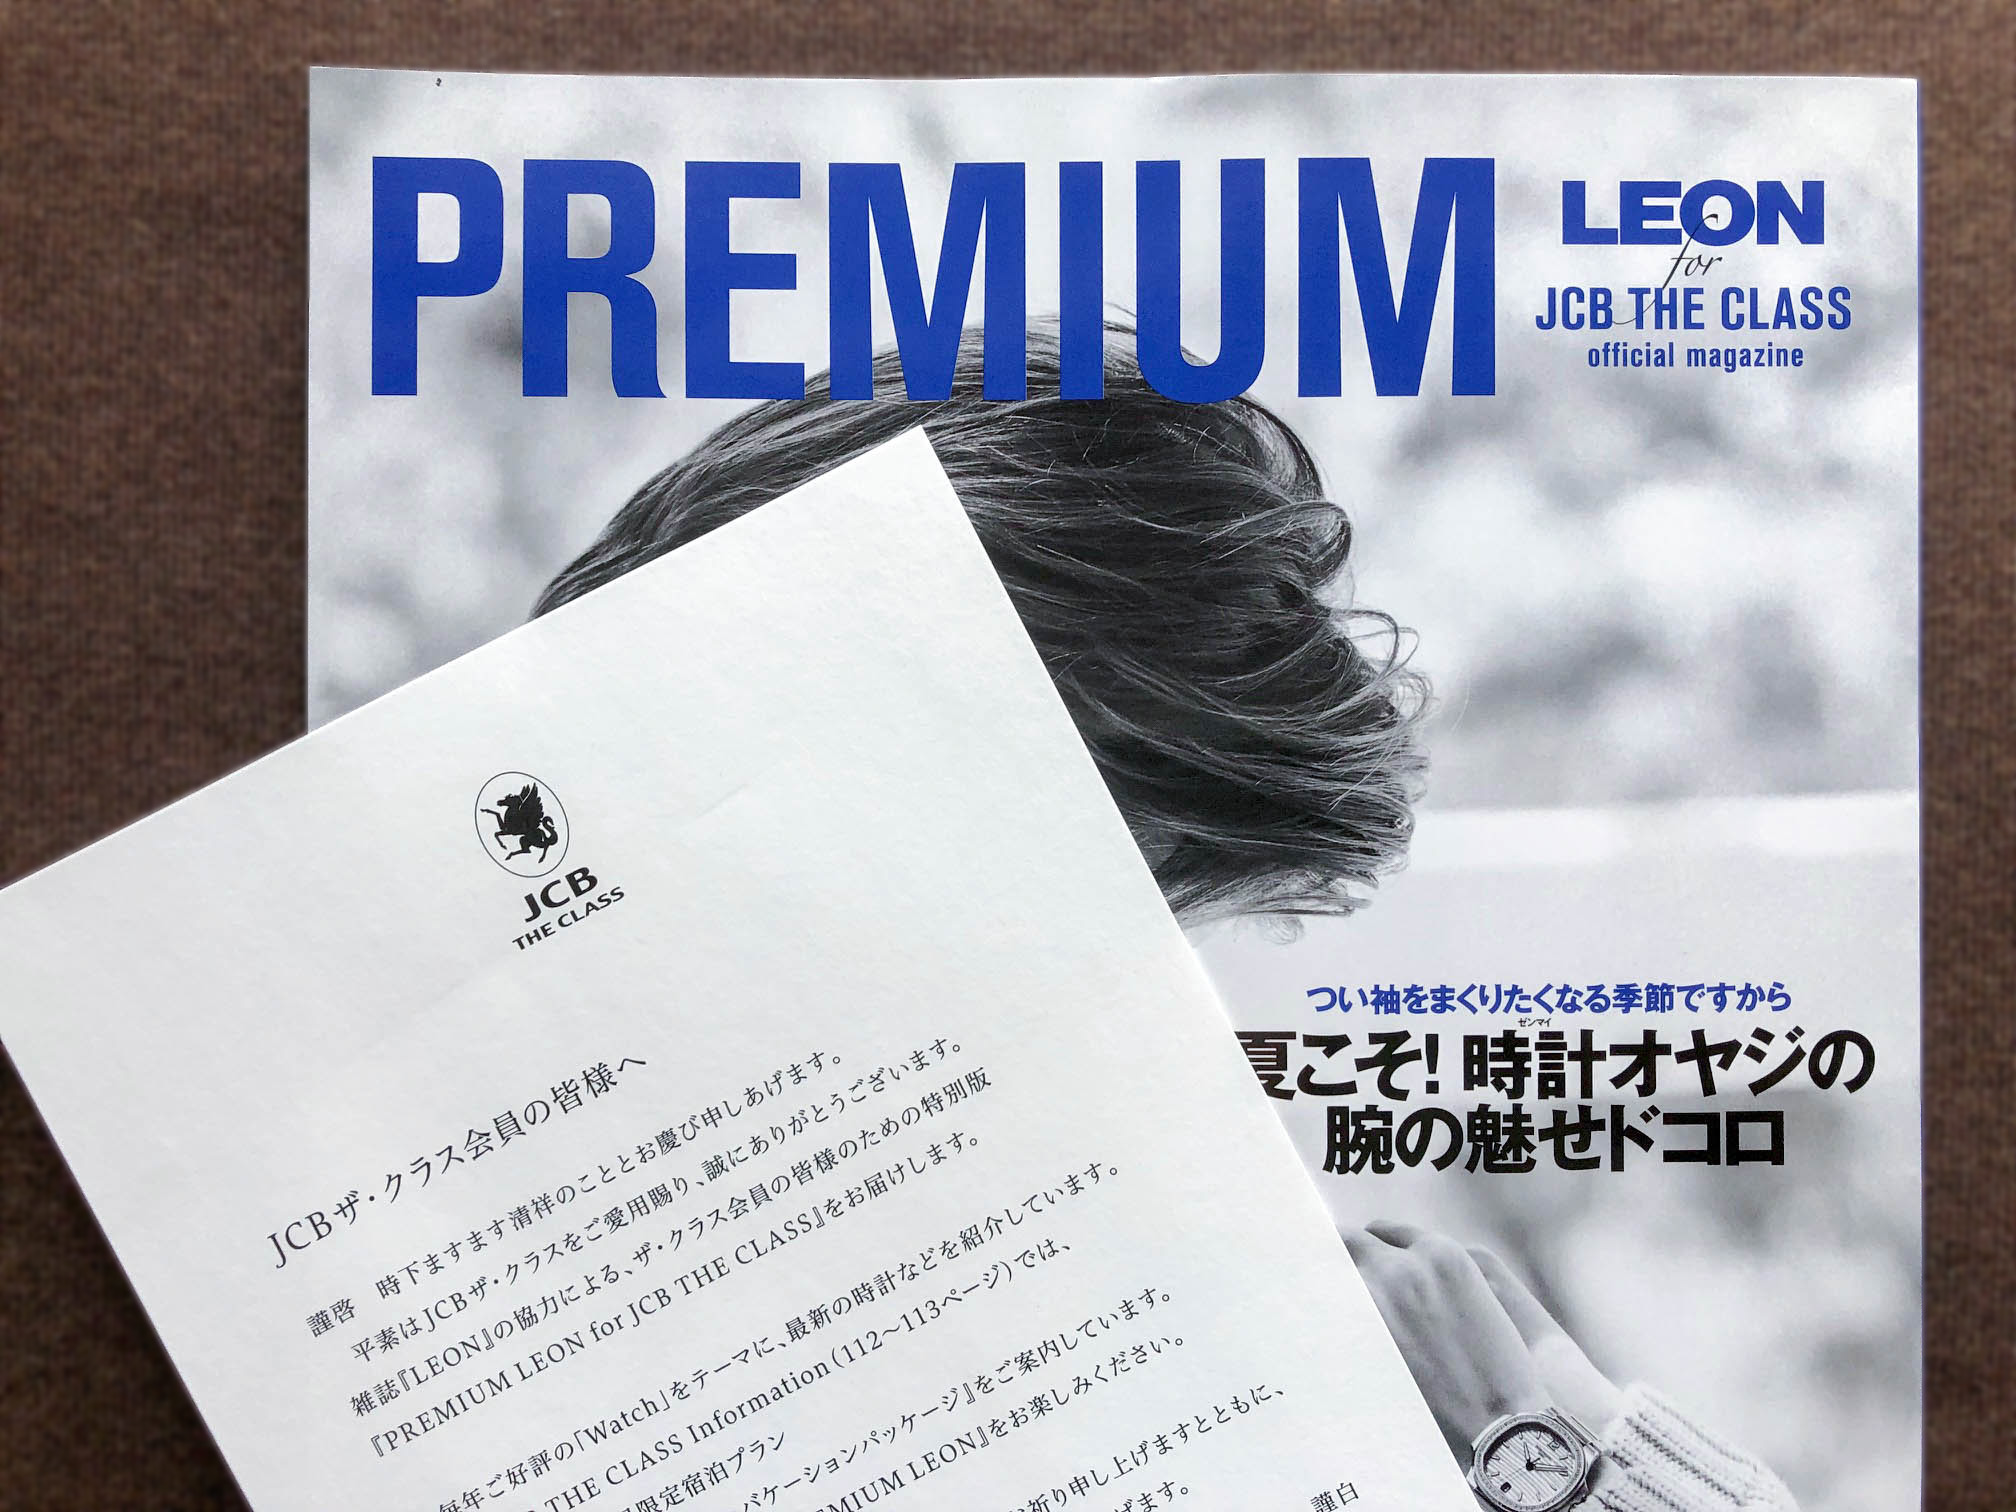 premium leon jcb the class 2019107 2